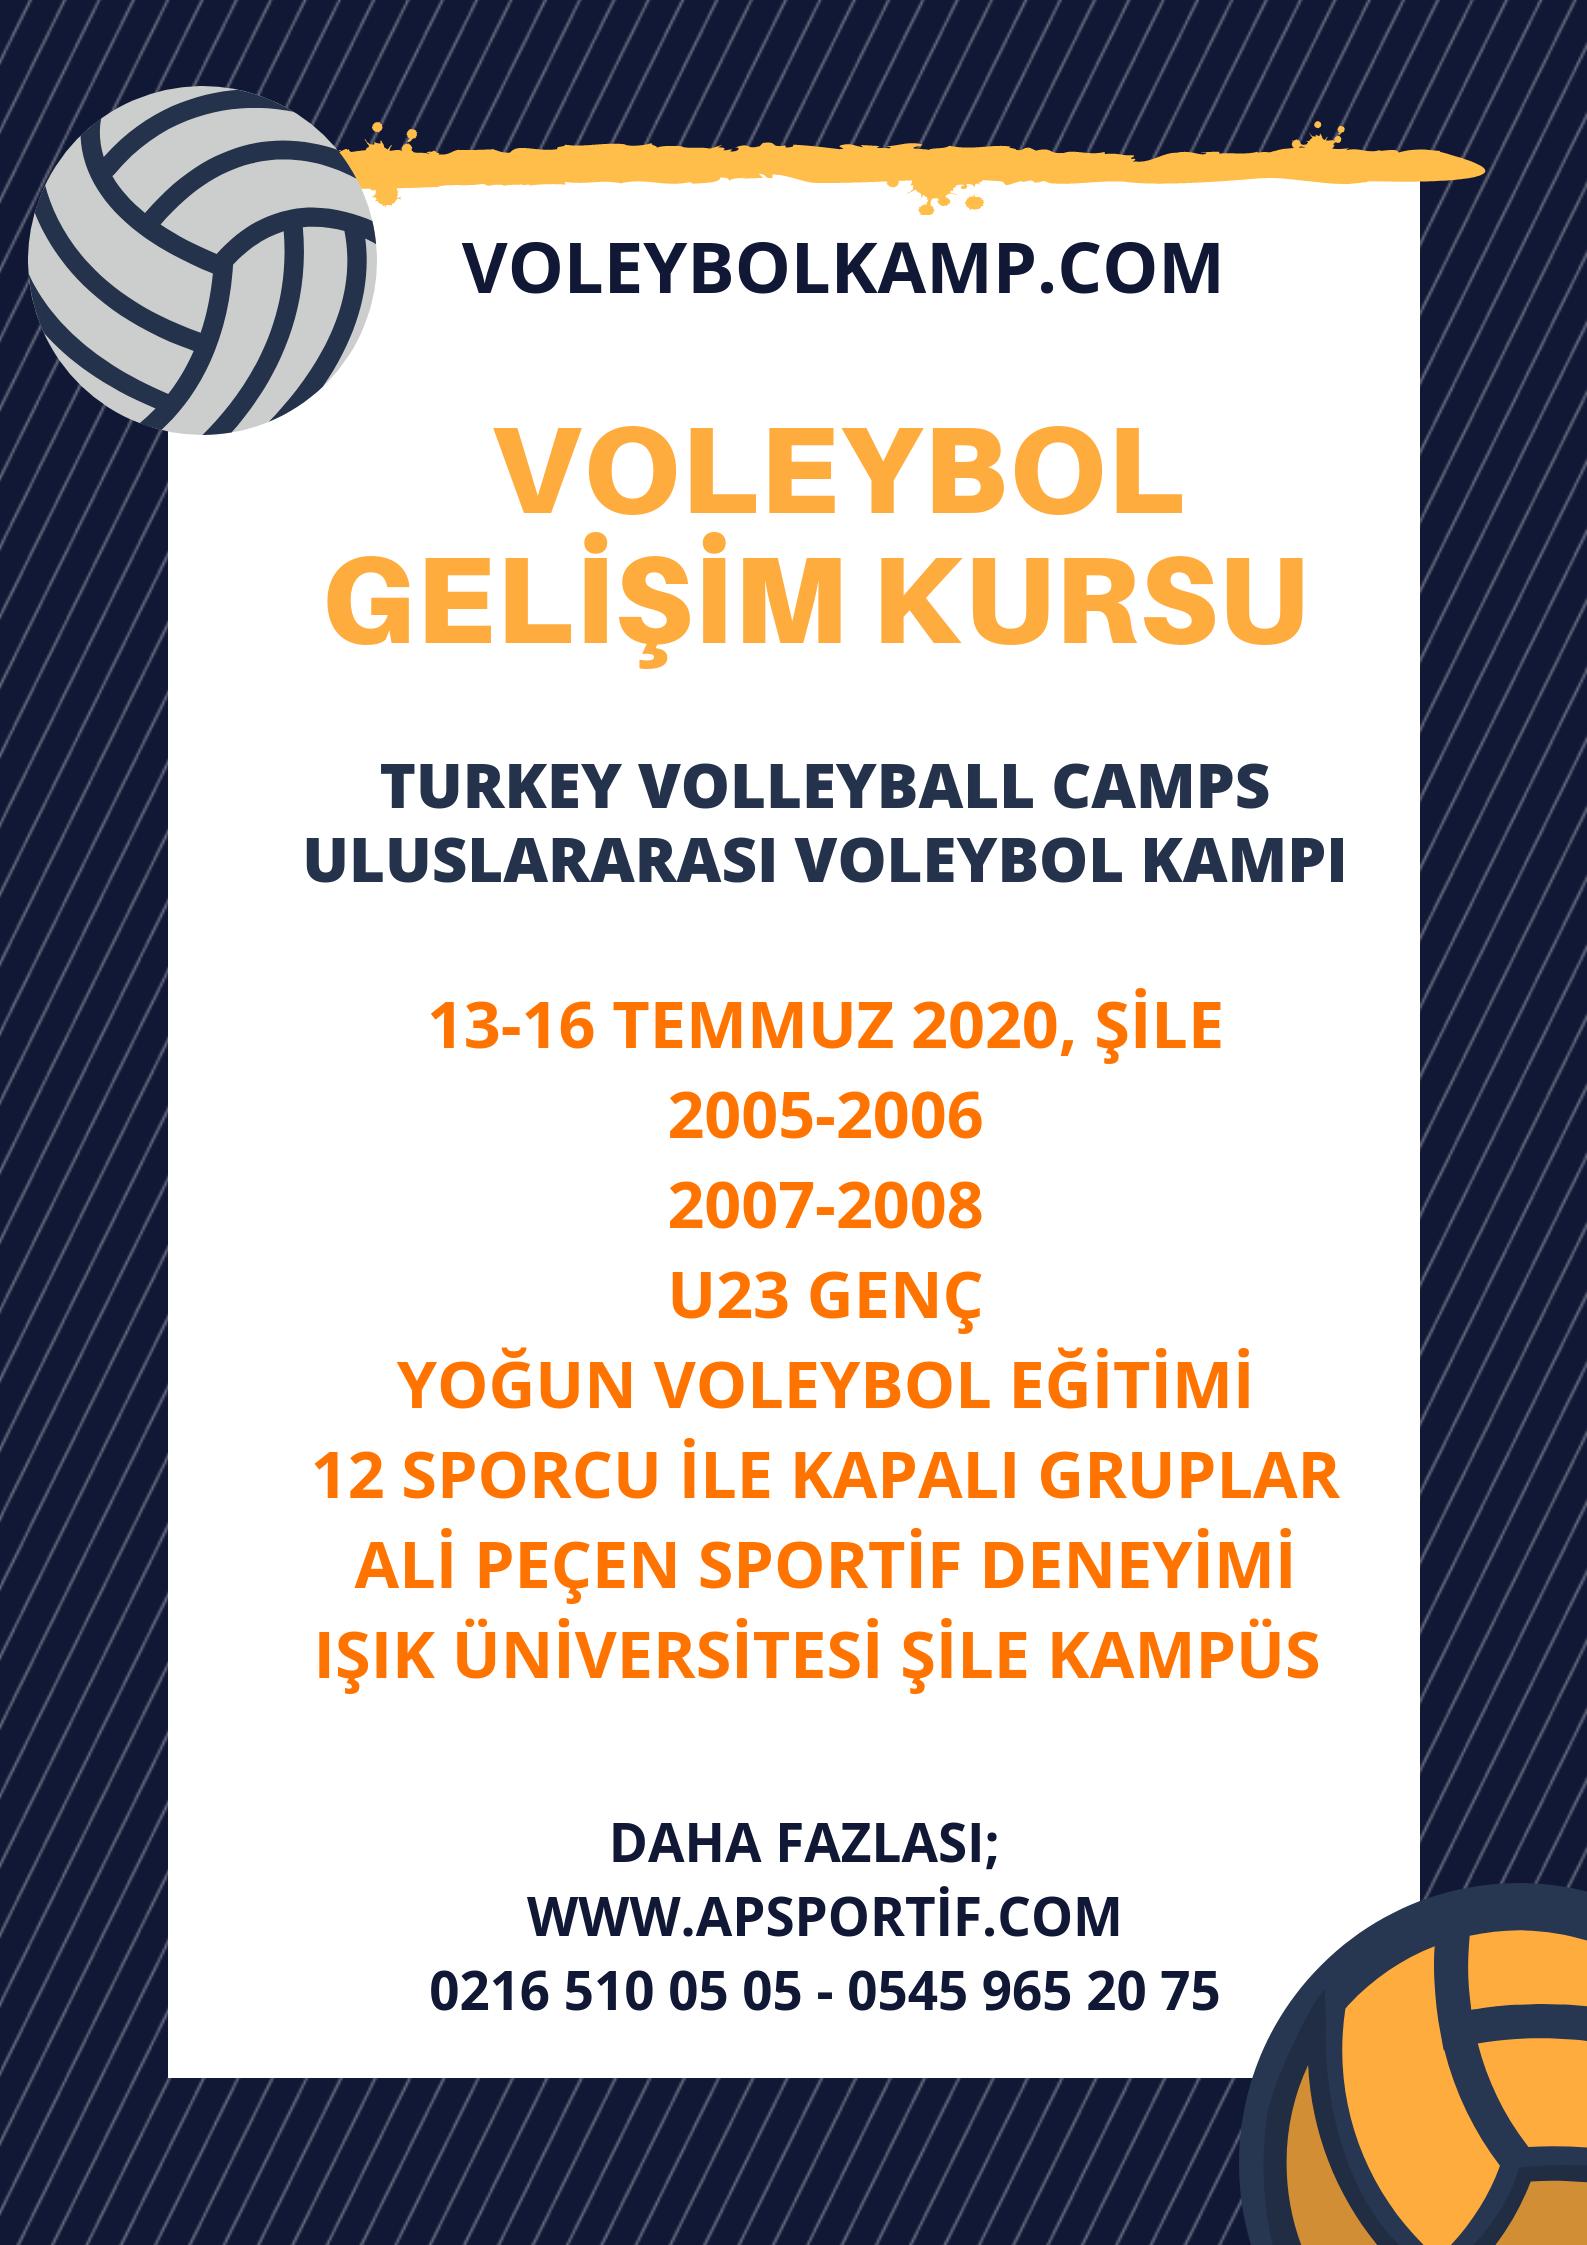 voleybol kursu, voleybol kampı, istanbul voleybol kursu, voleybol okulu.